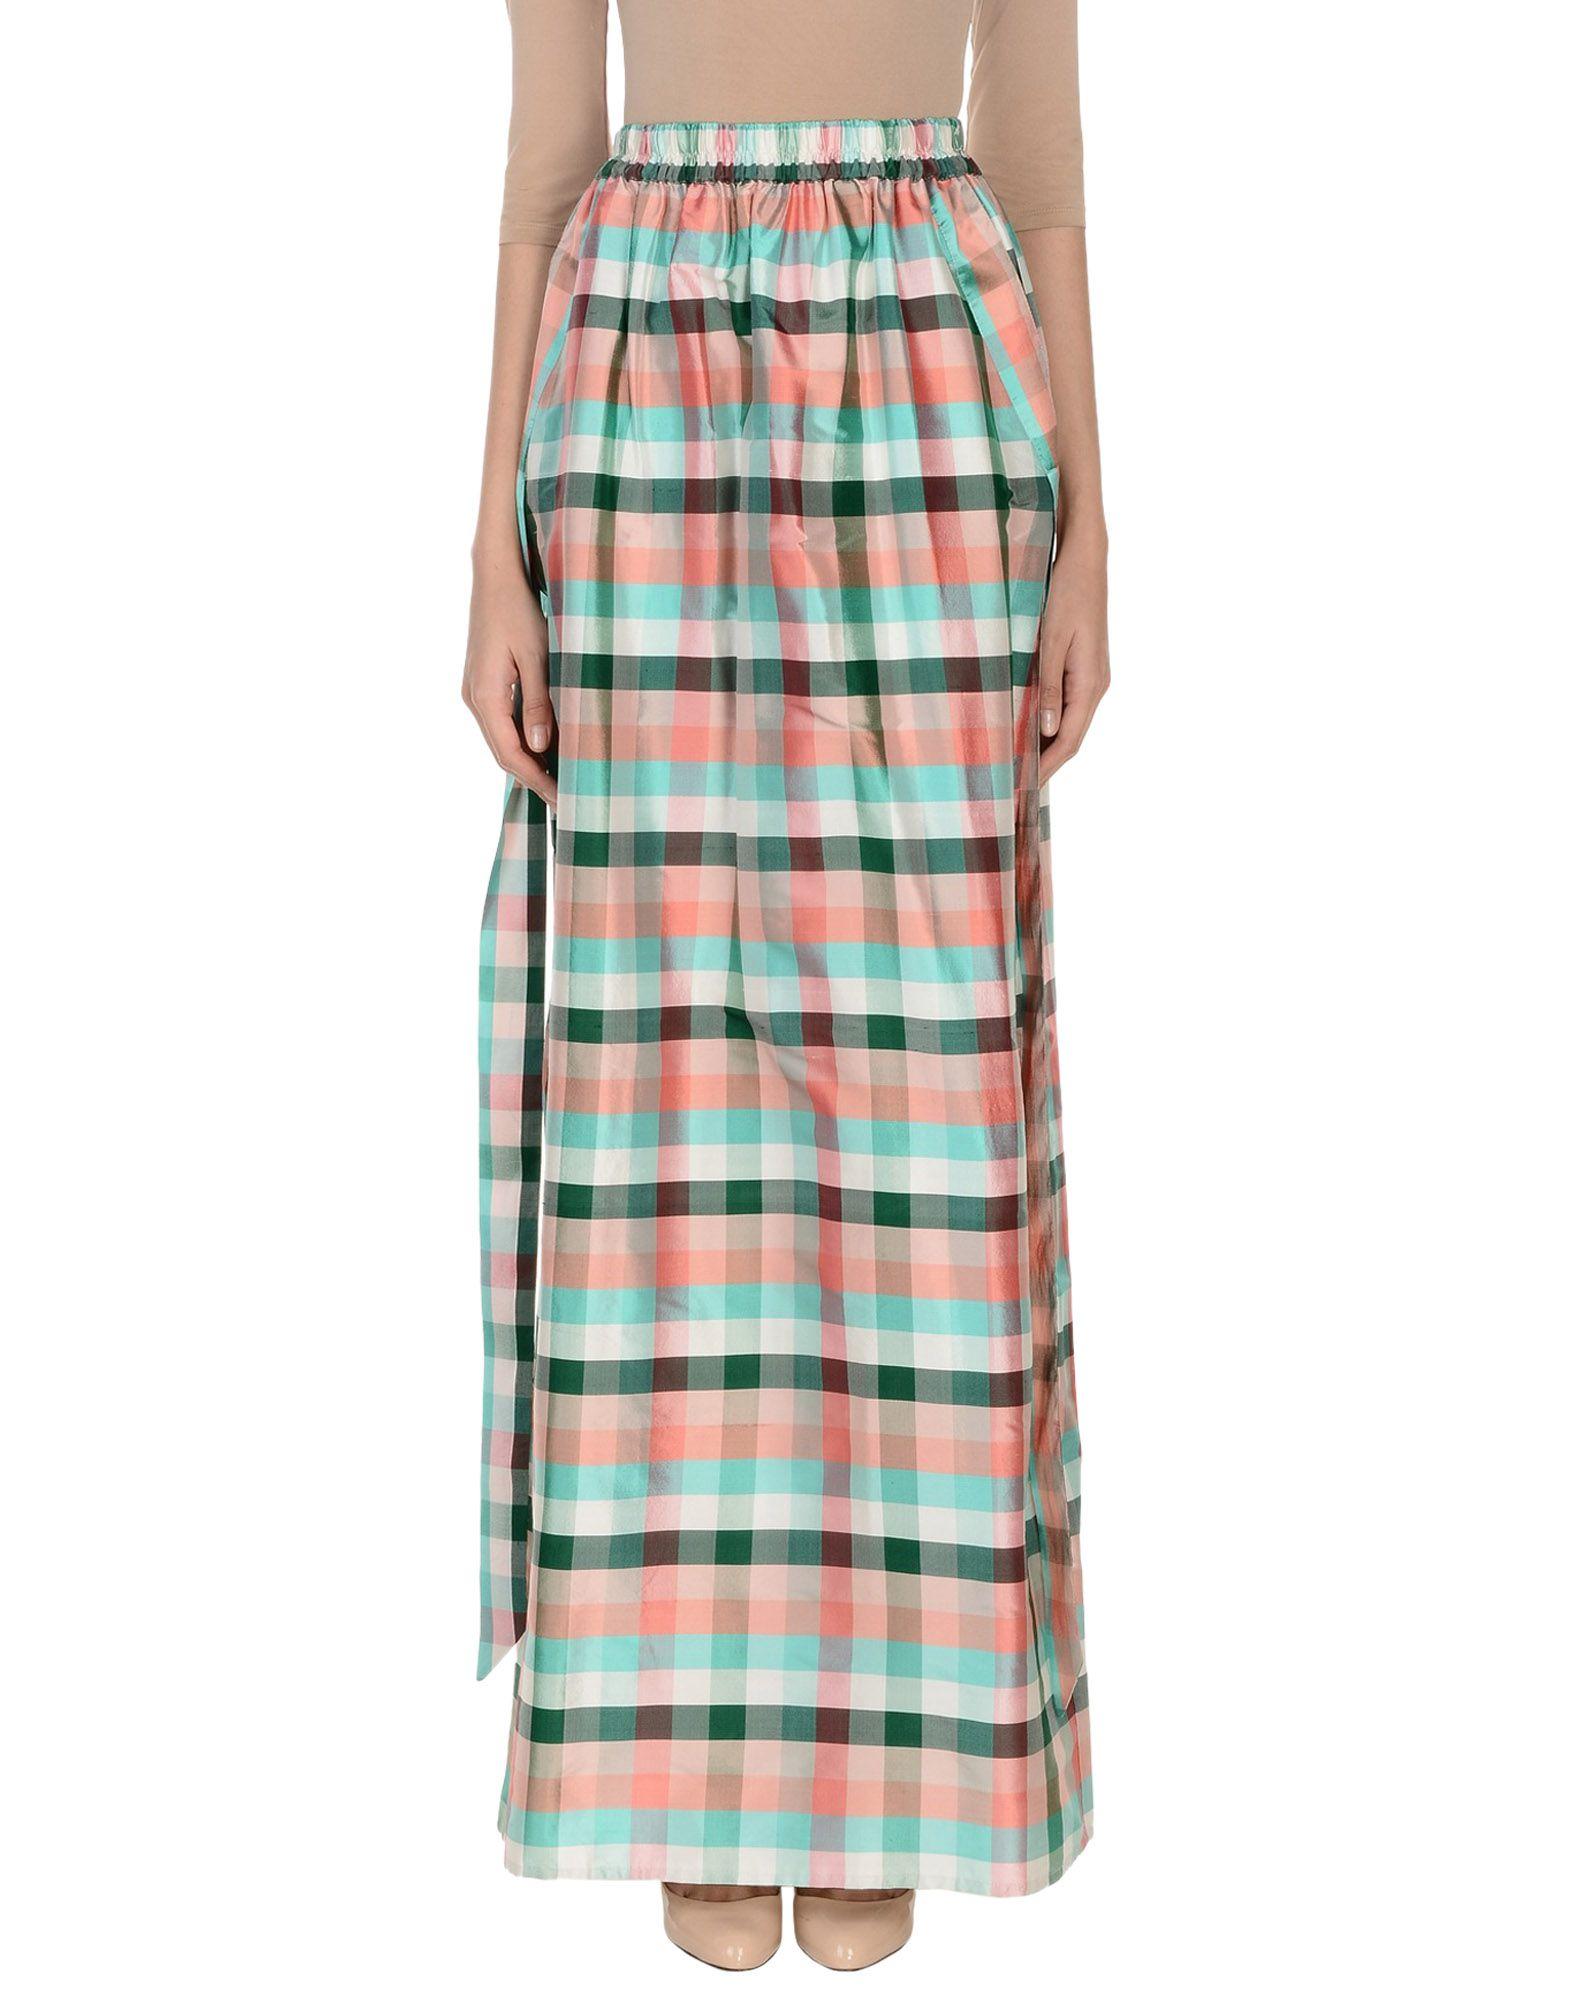 ANDREA INCONTRI Maxi Skirts in Light Green